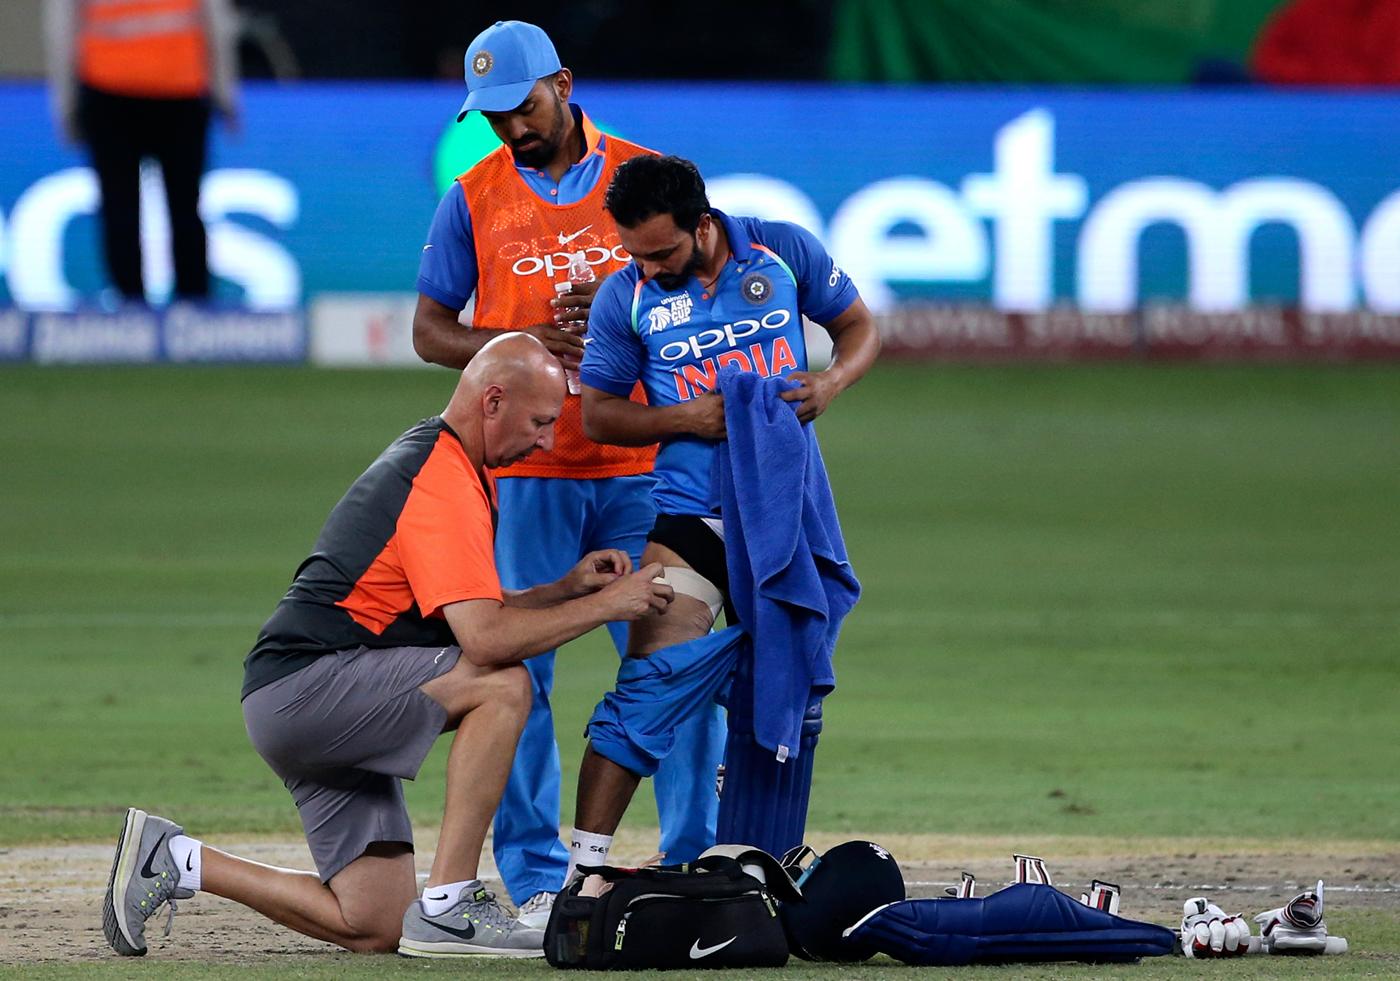 MSK Prasad Defends Selection Panel After Not Including Kedar Jadhav In India ODI Squad For Windies Series 1